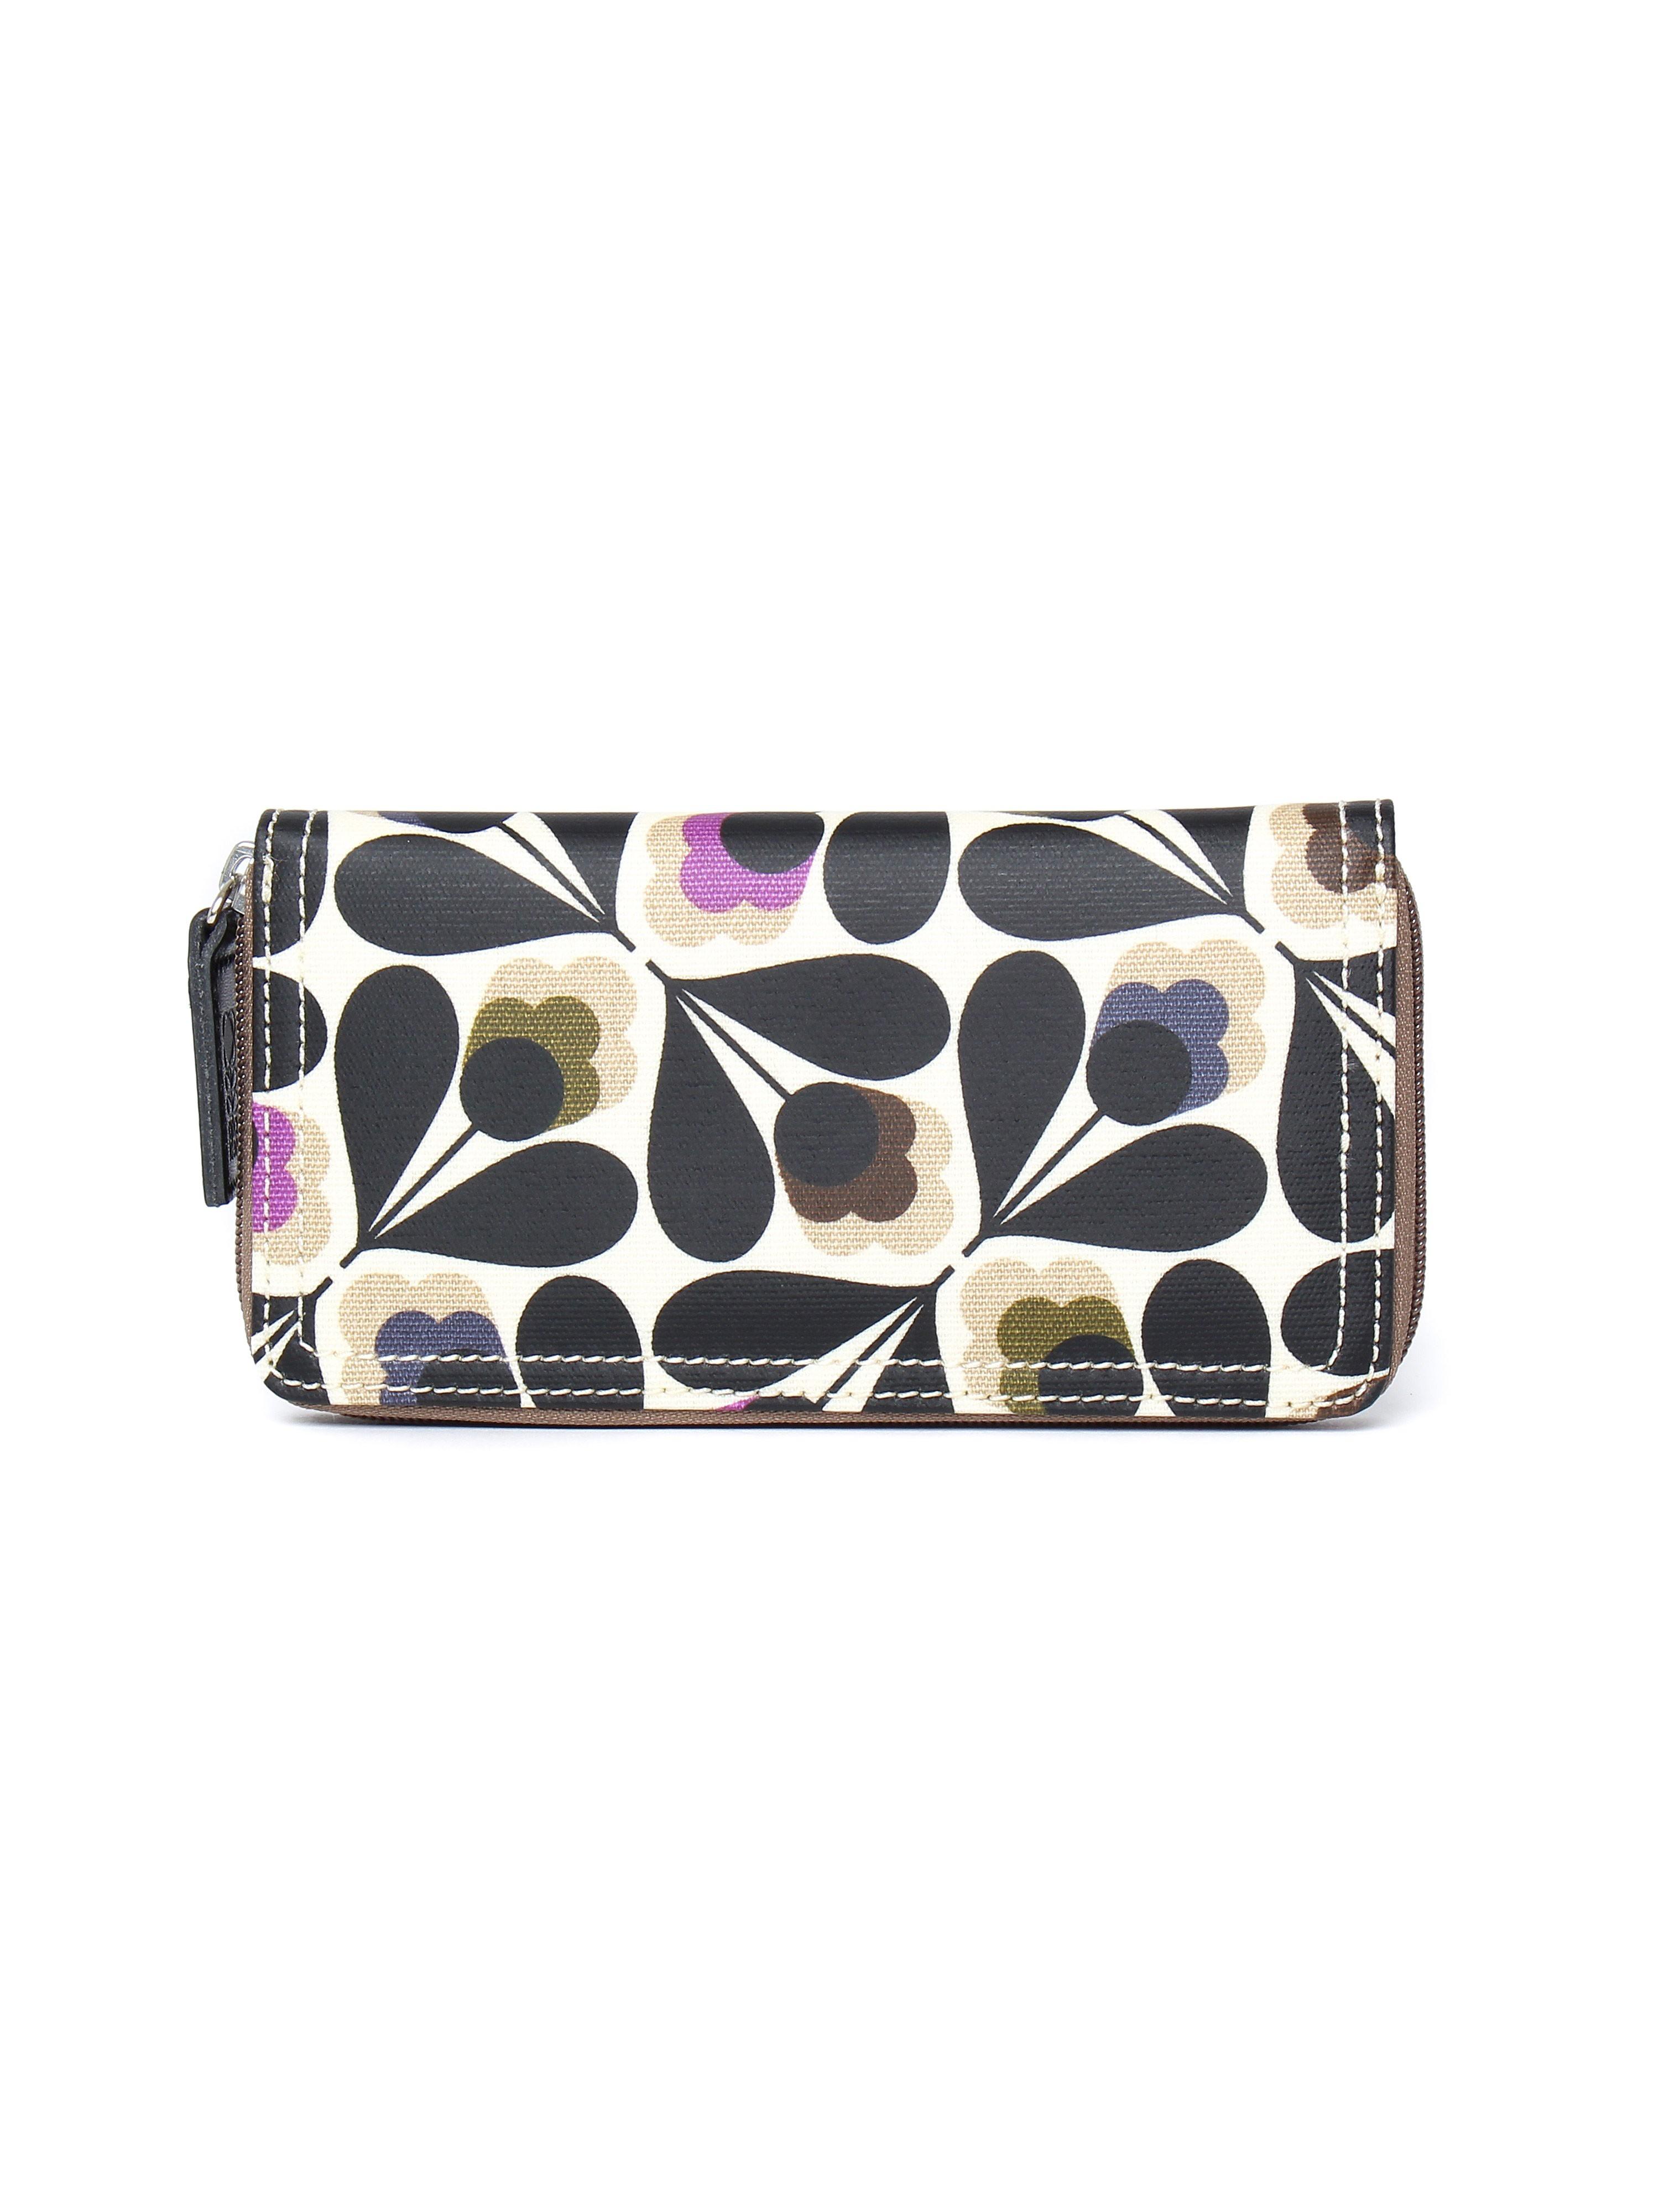 Orla Kiely Women's Big Zip Sycamore Seed Wallet -Multi